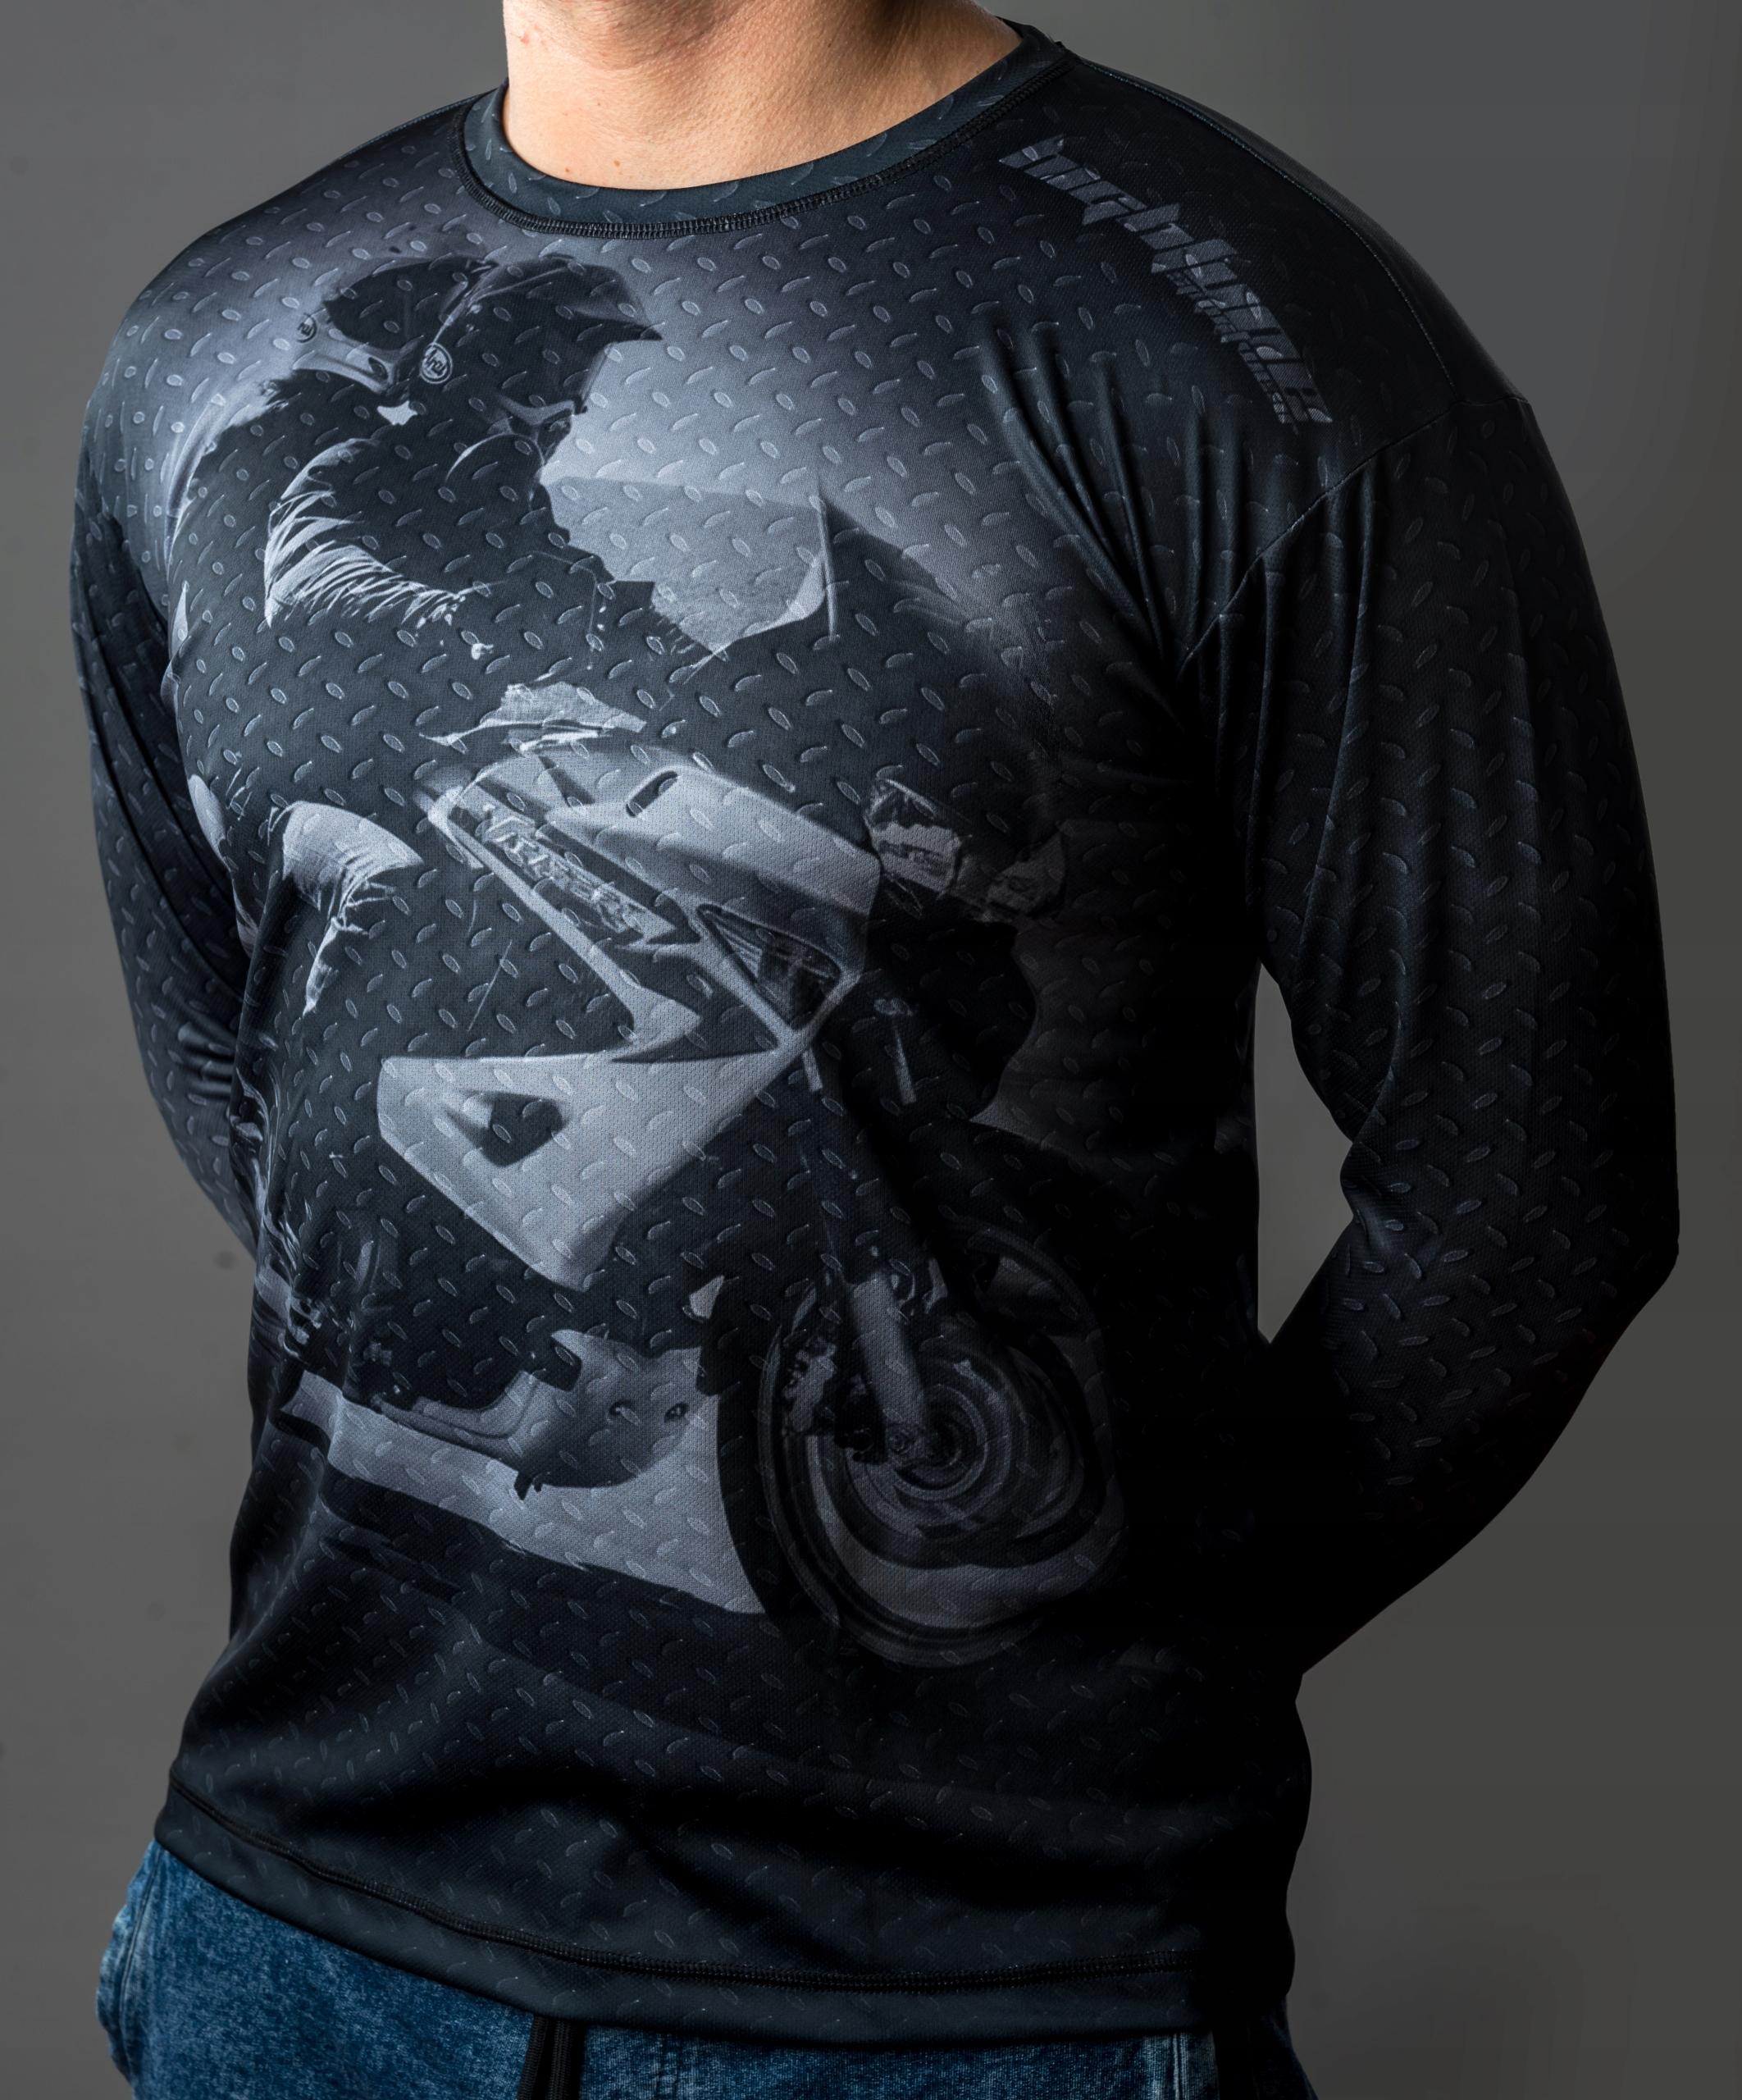 1cf1d928f4c0b3 Termo koszulka długi rękaw HONDA VARADERO 7511346050 - Allegro.pl